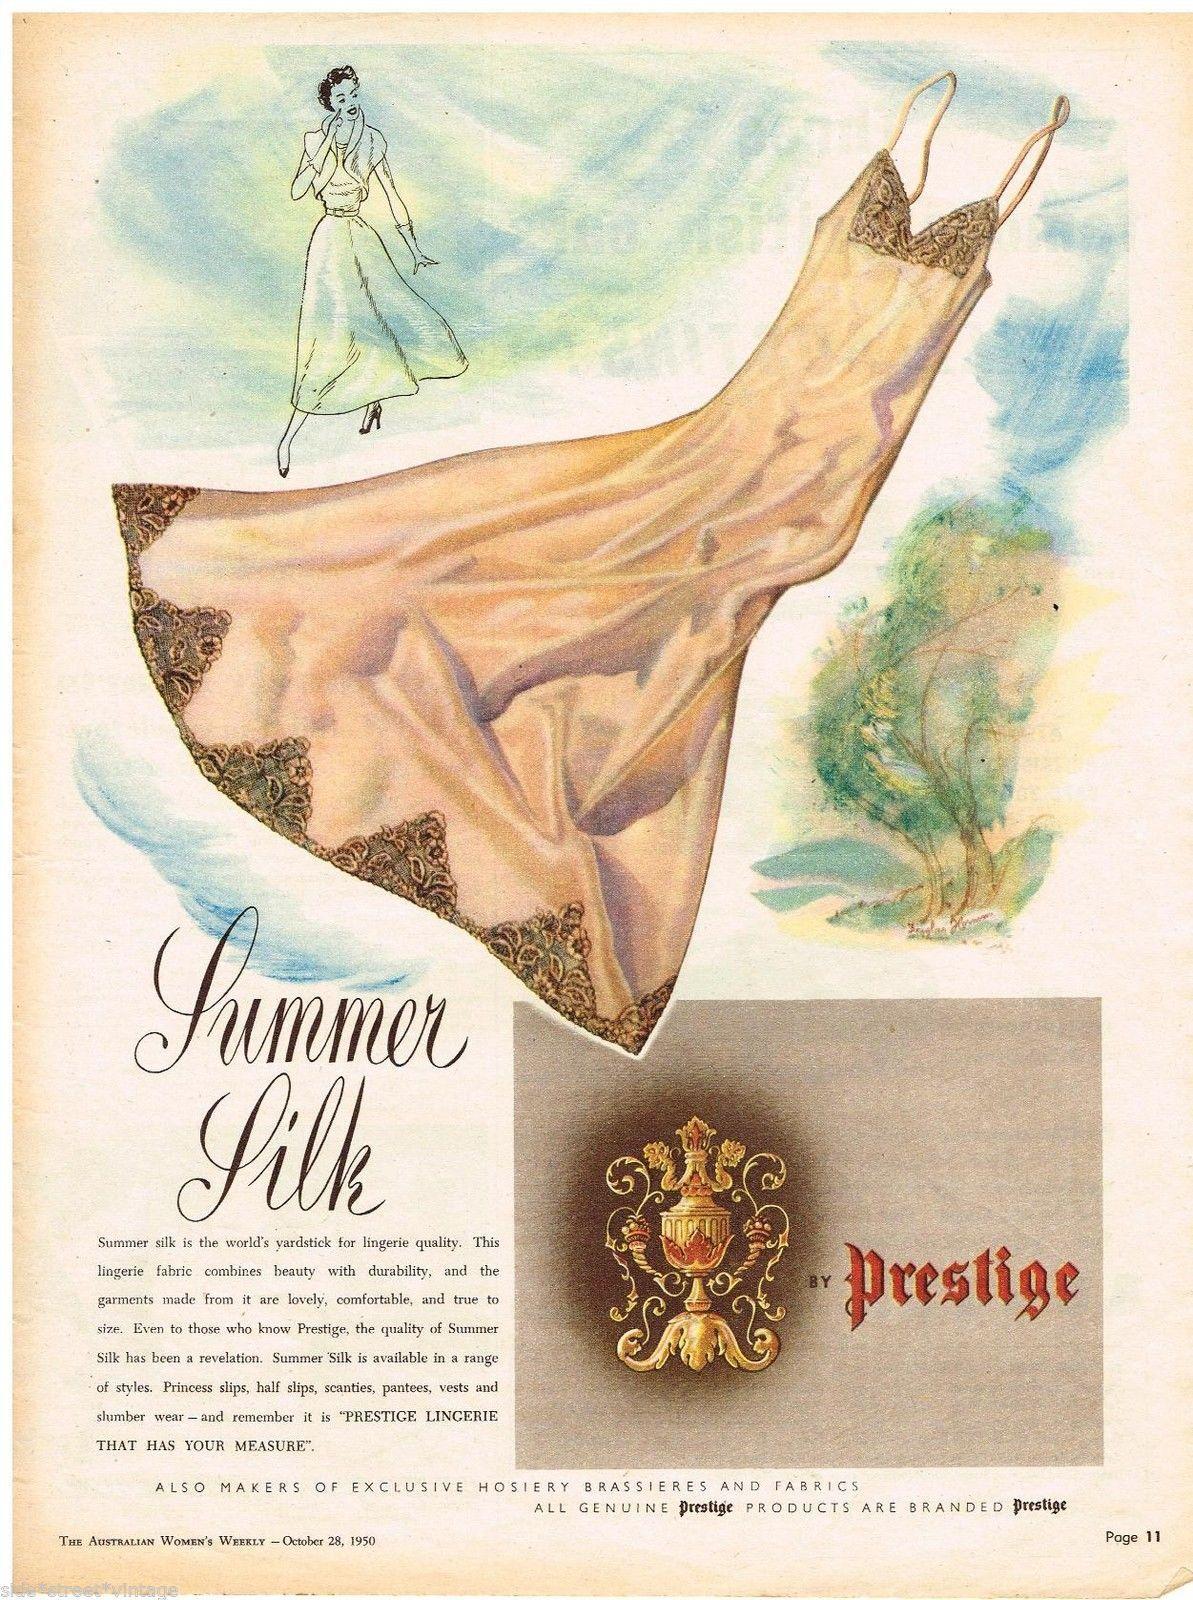 Prestige Lingerie Ad Retro Summer Silk Vintage Advertising 1950 Original Advert   eBay